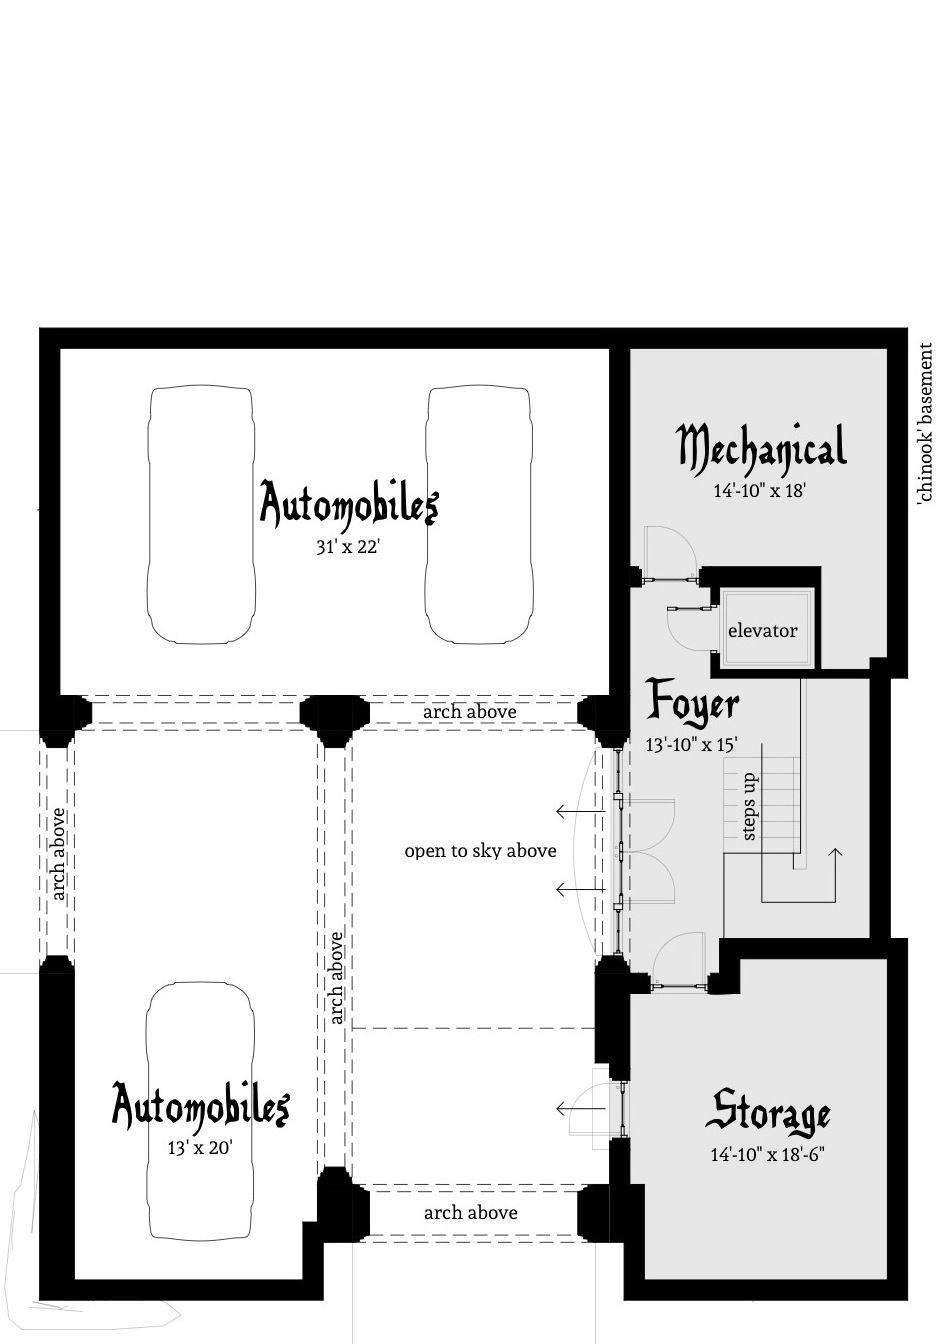 Dantyree Com Nbspthis Website Is For Sale Nbspdantyree Resources And Information Castle Plans Basement Floor Plans Castle House Plans